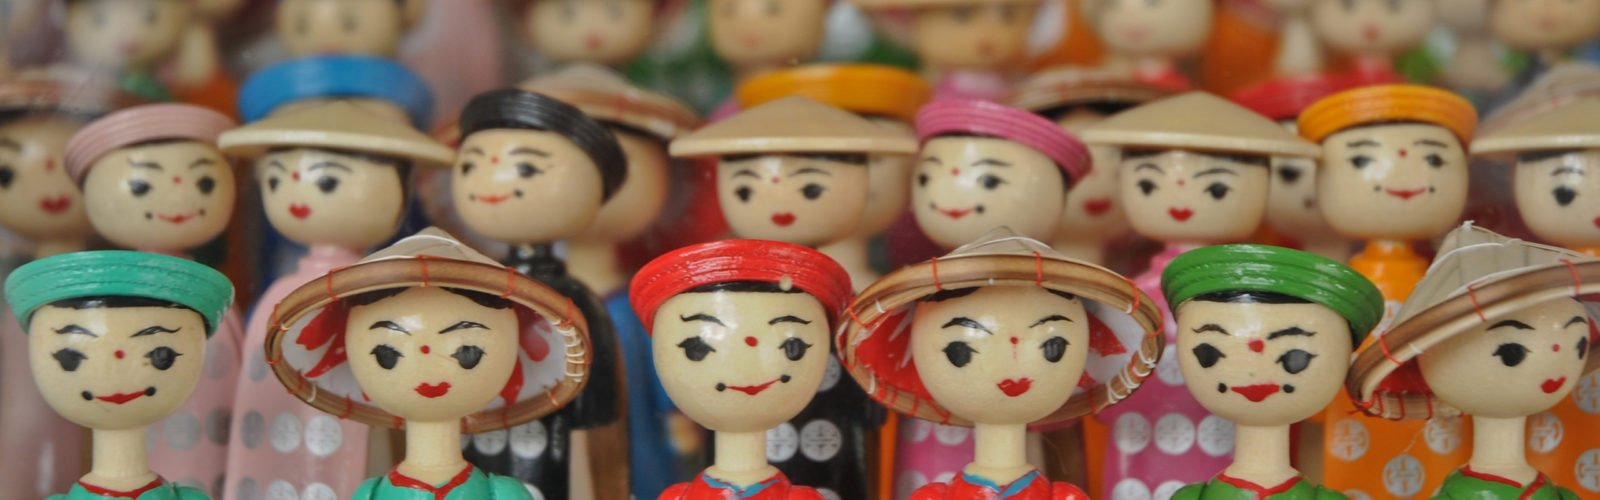 hanoi-dolls